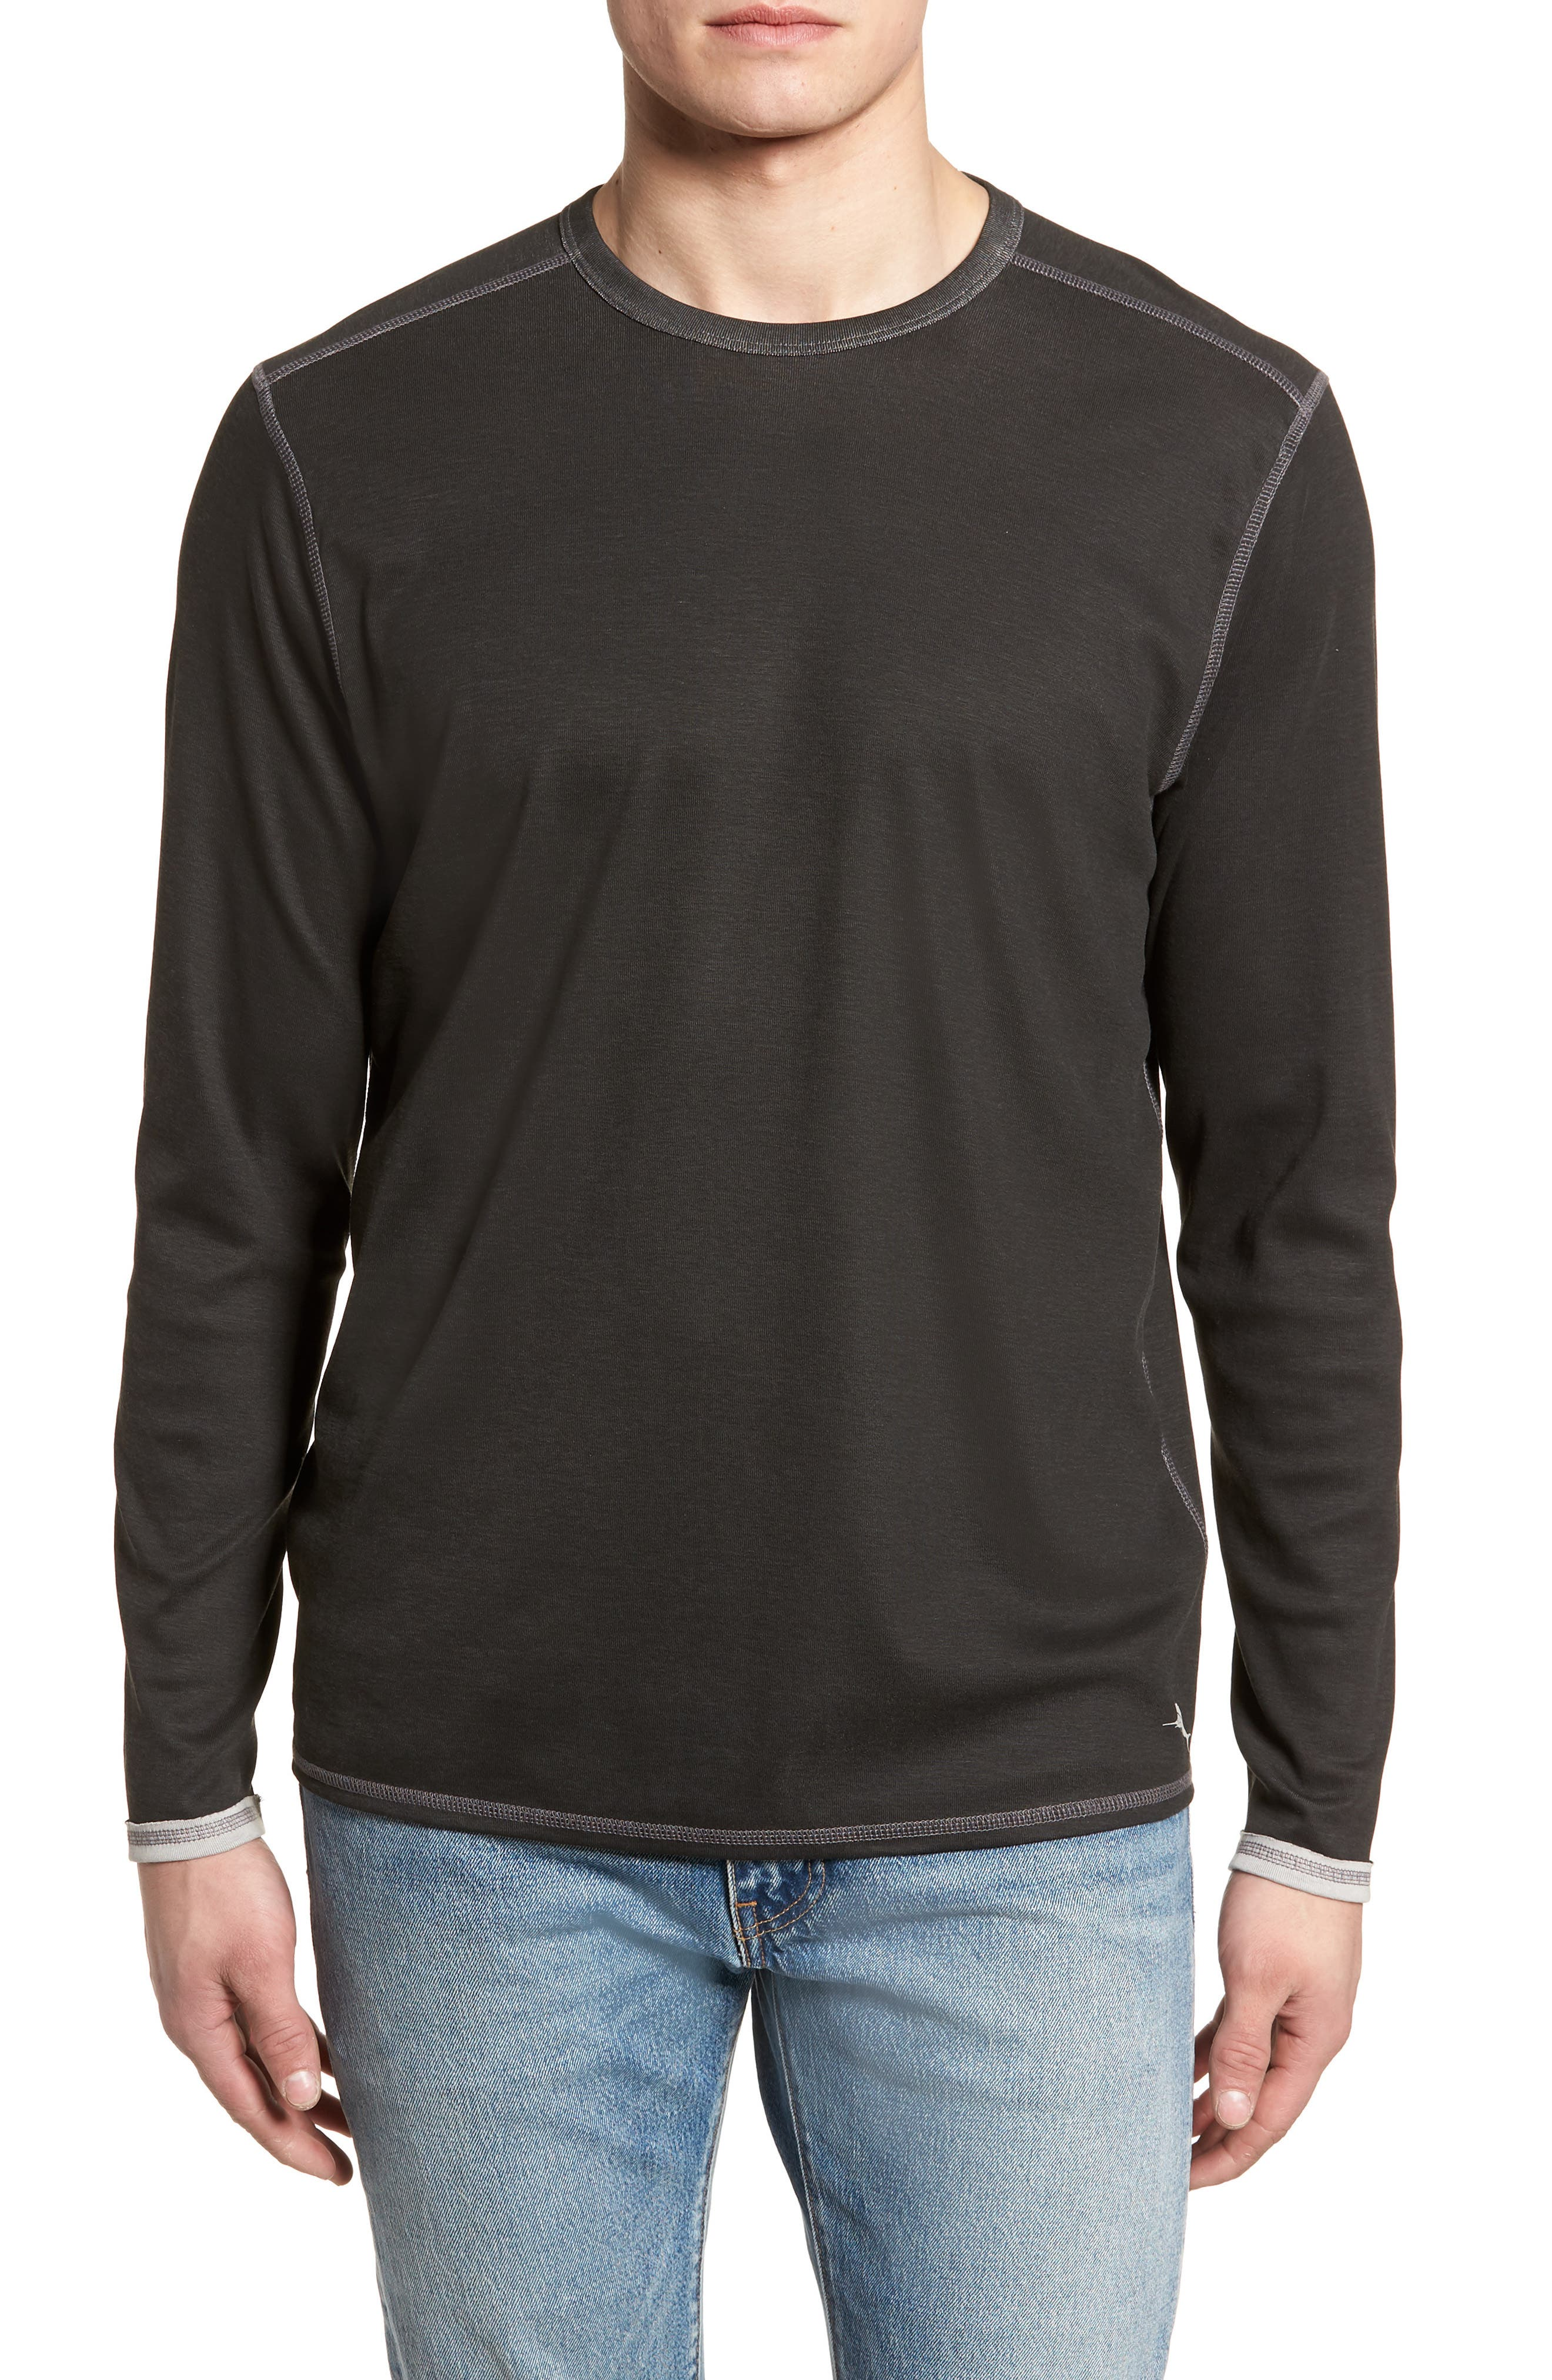 Dual in the Sun Reversible T-Shirt,                         Main,                         color, Black